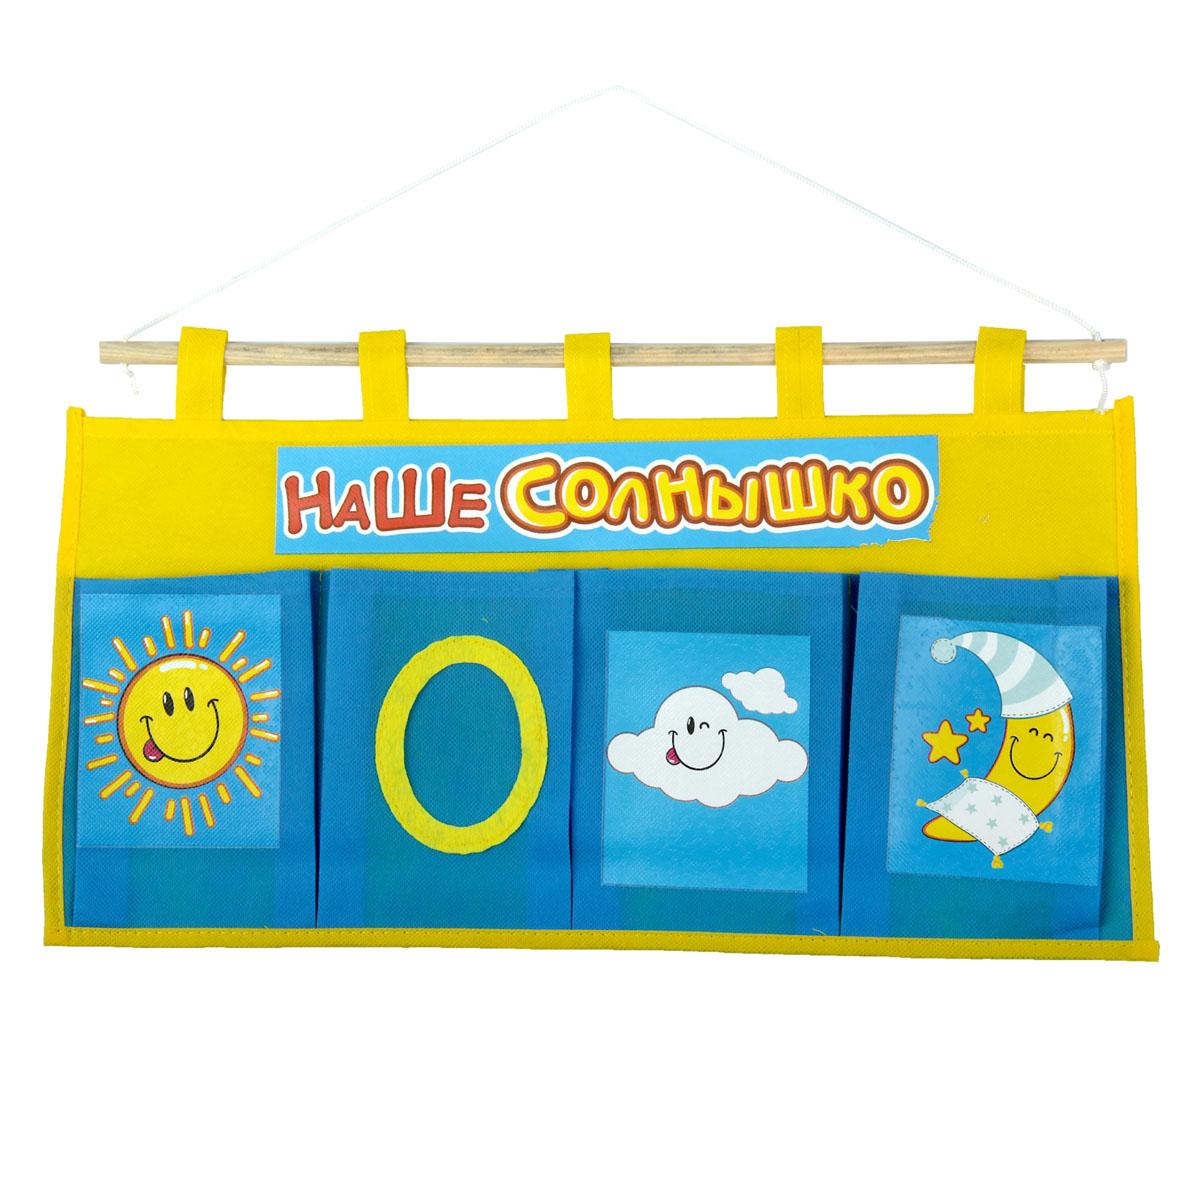 Кармашки на стену Sima-land Наше солнышко, цвет: голубой, желтый, белый, 4 шт кармашки на стену sima land кружевные вертикальные 4 шт цвет зеленый молочный